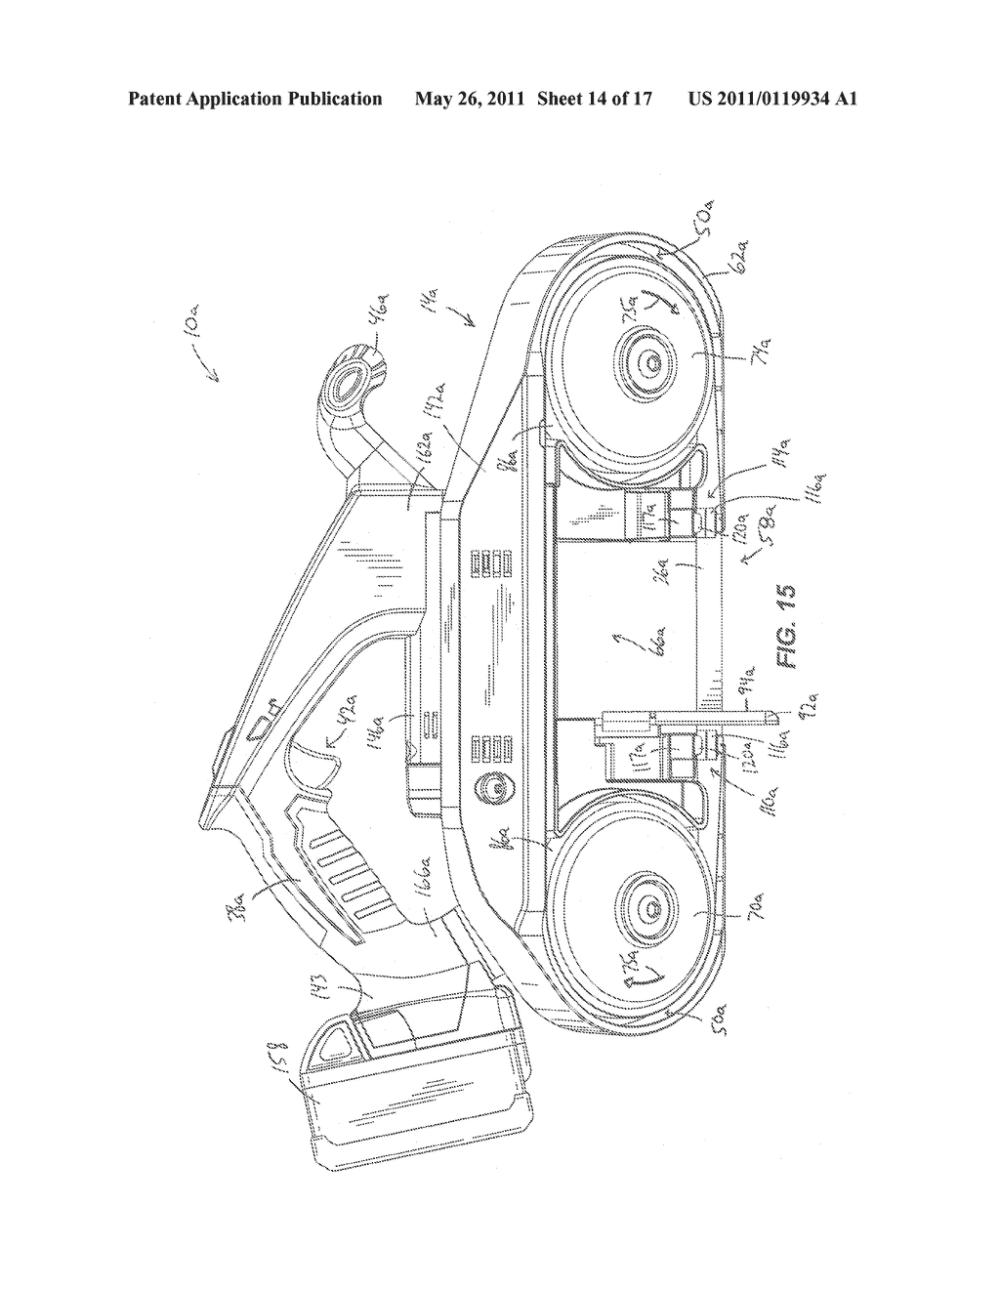 medium resolution of band saw diagram schematic and image 15 rh patentsencyclopedia com rip saw skill saw makita portable